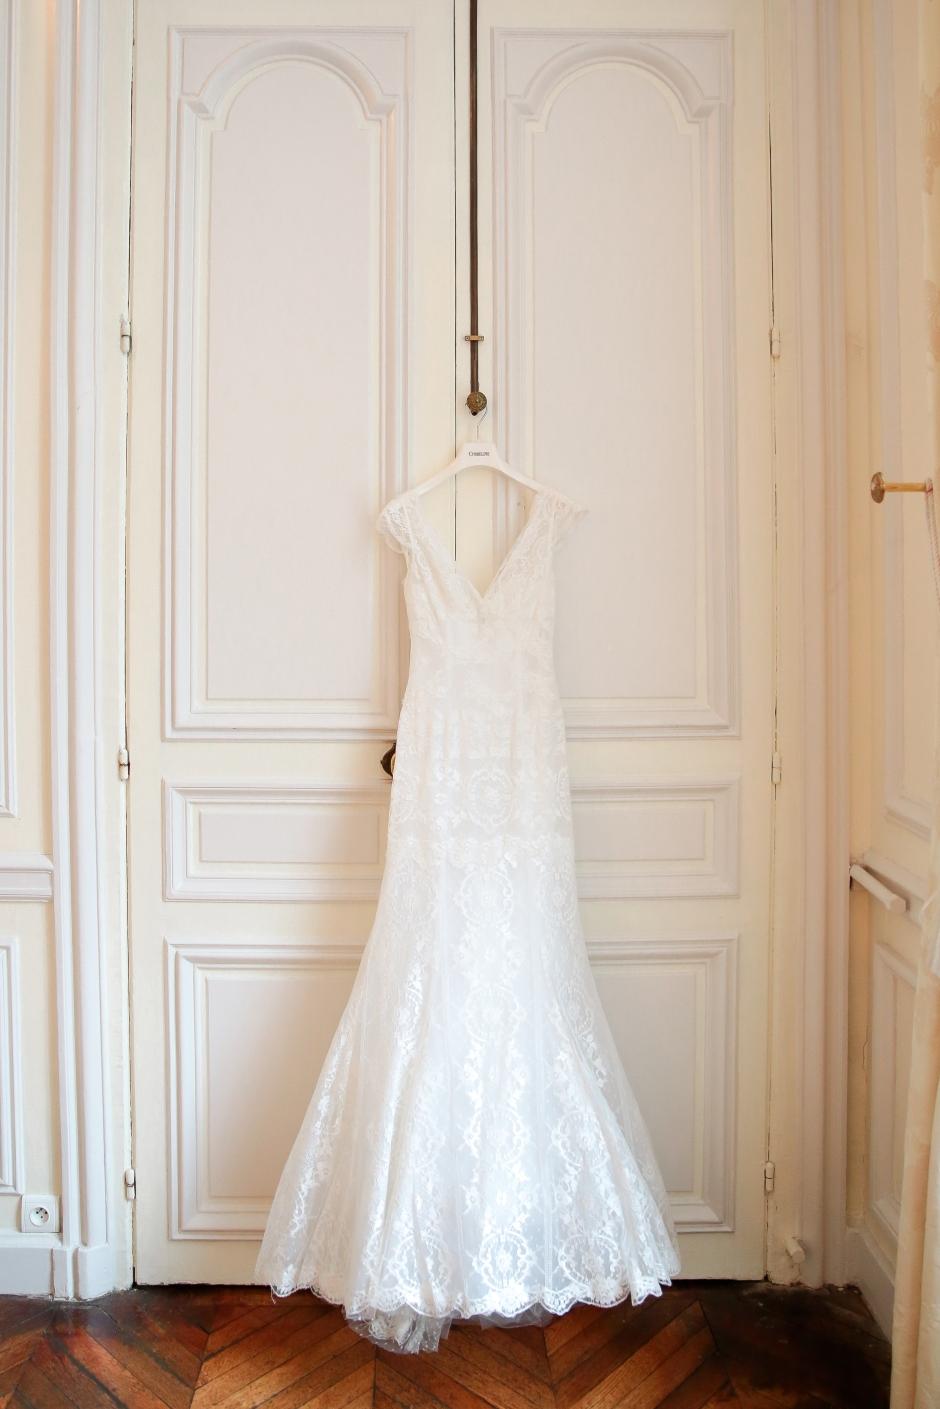 Mariage nude au Chateau de Santeny - La Blogueuse Mariage (2)